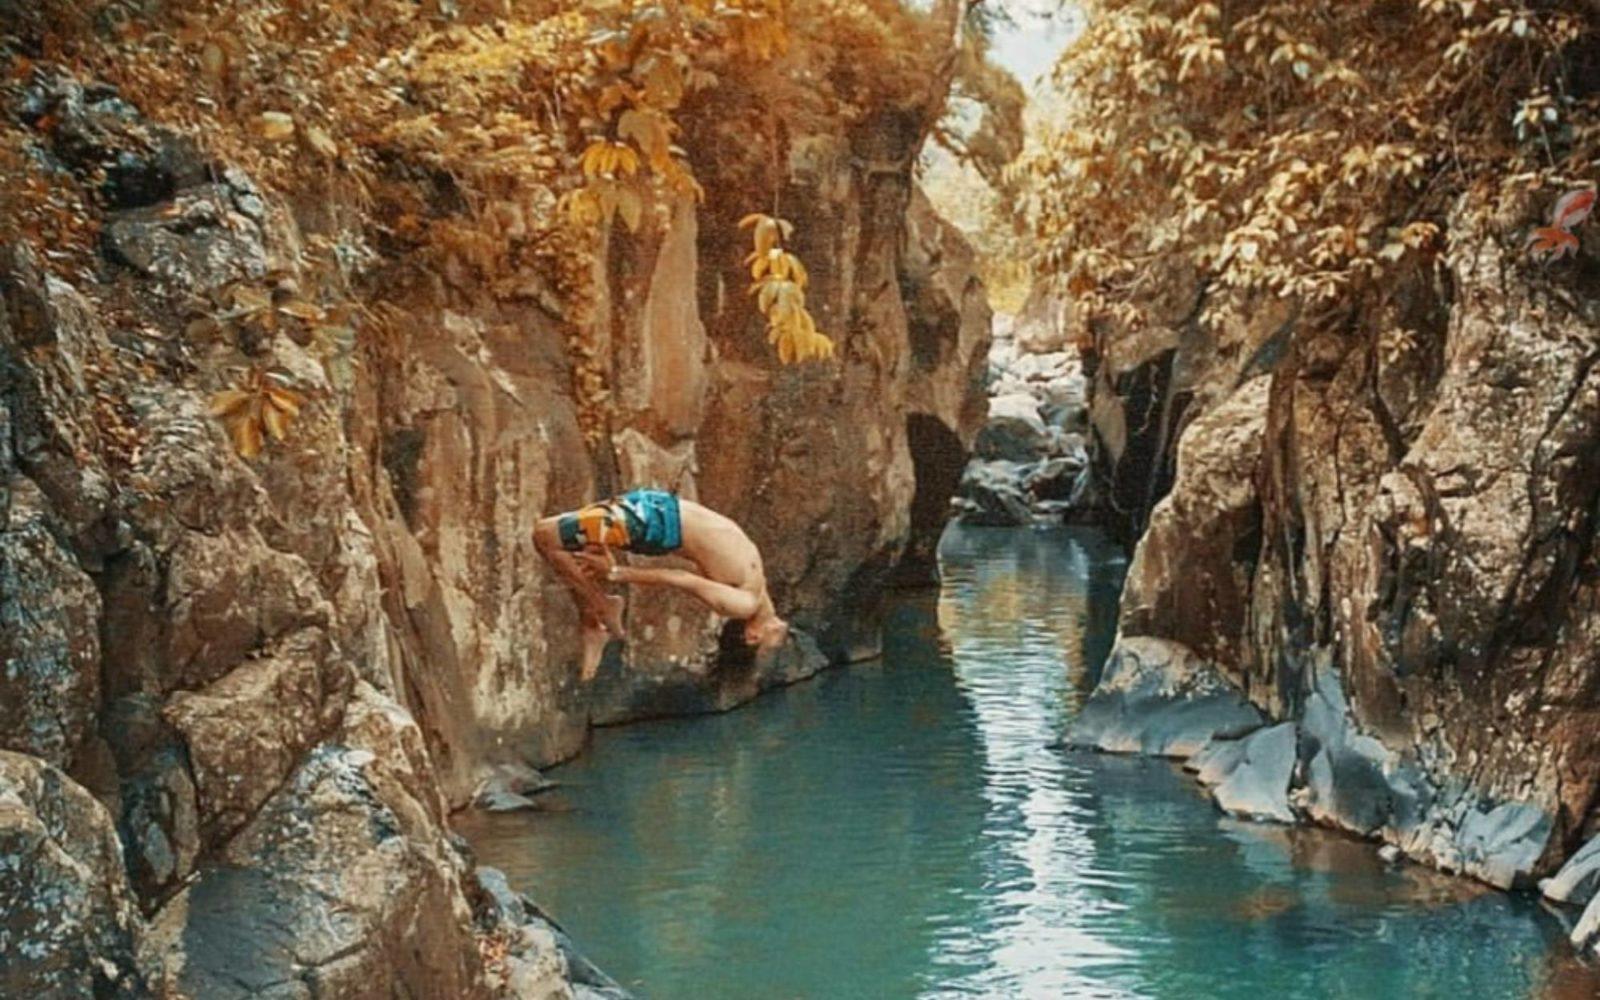 Leuwi Jurig Eksotisme Aliran Sungai Bungbulang November 9